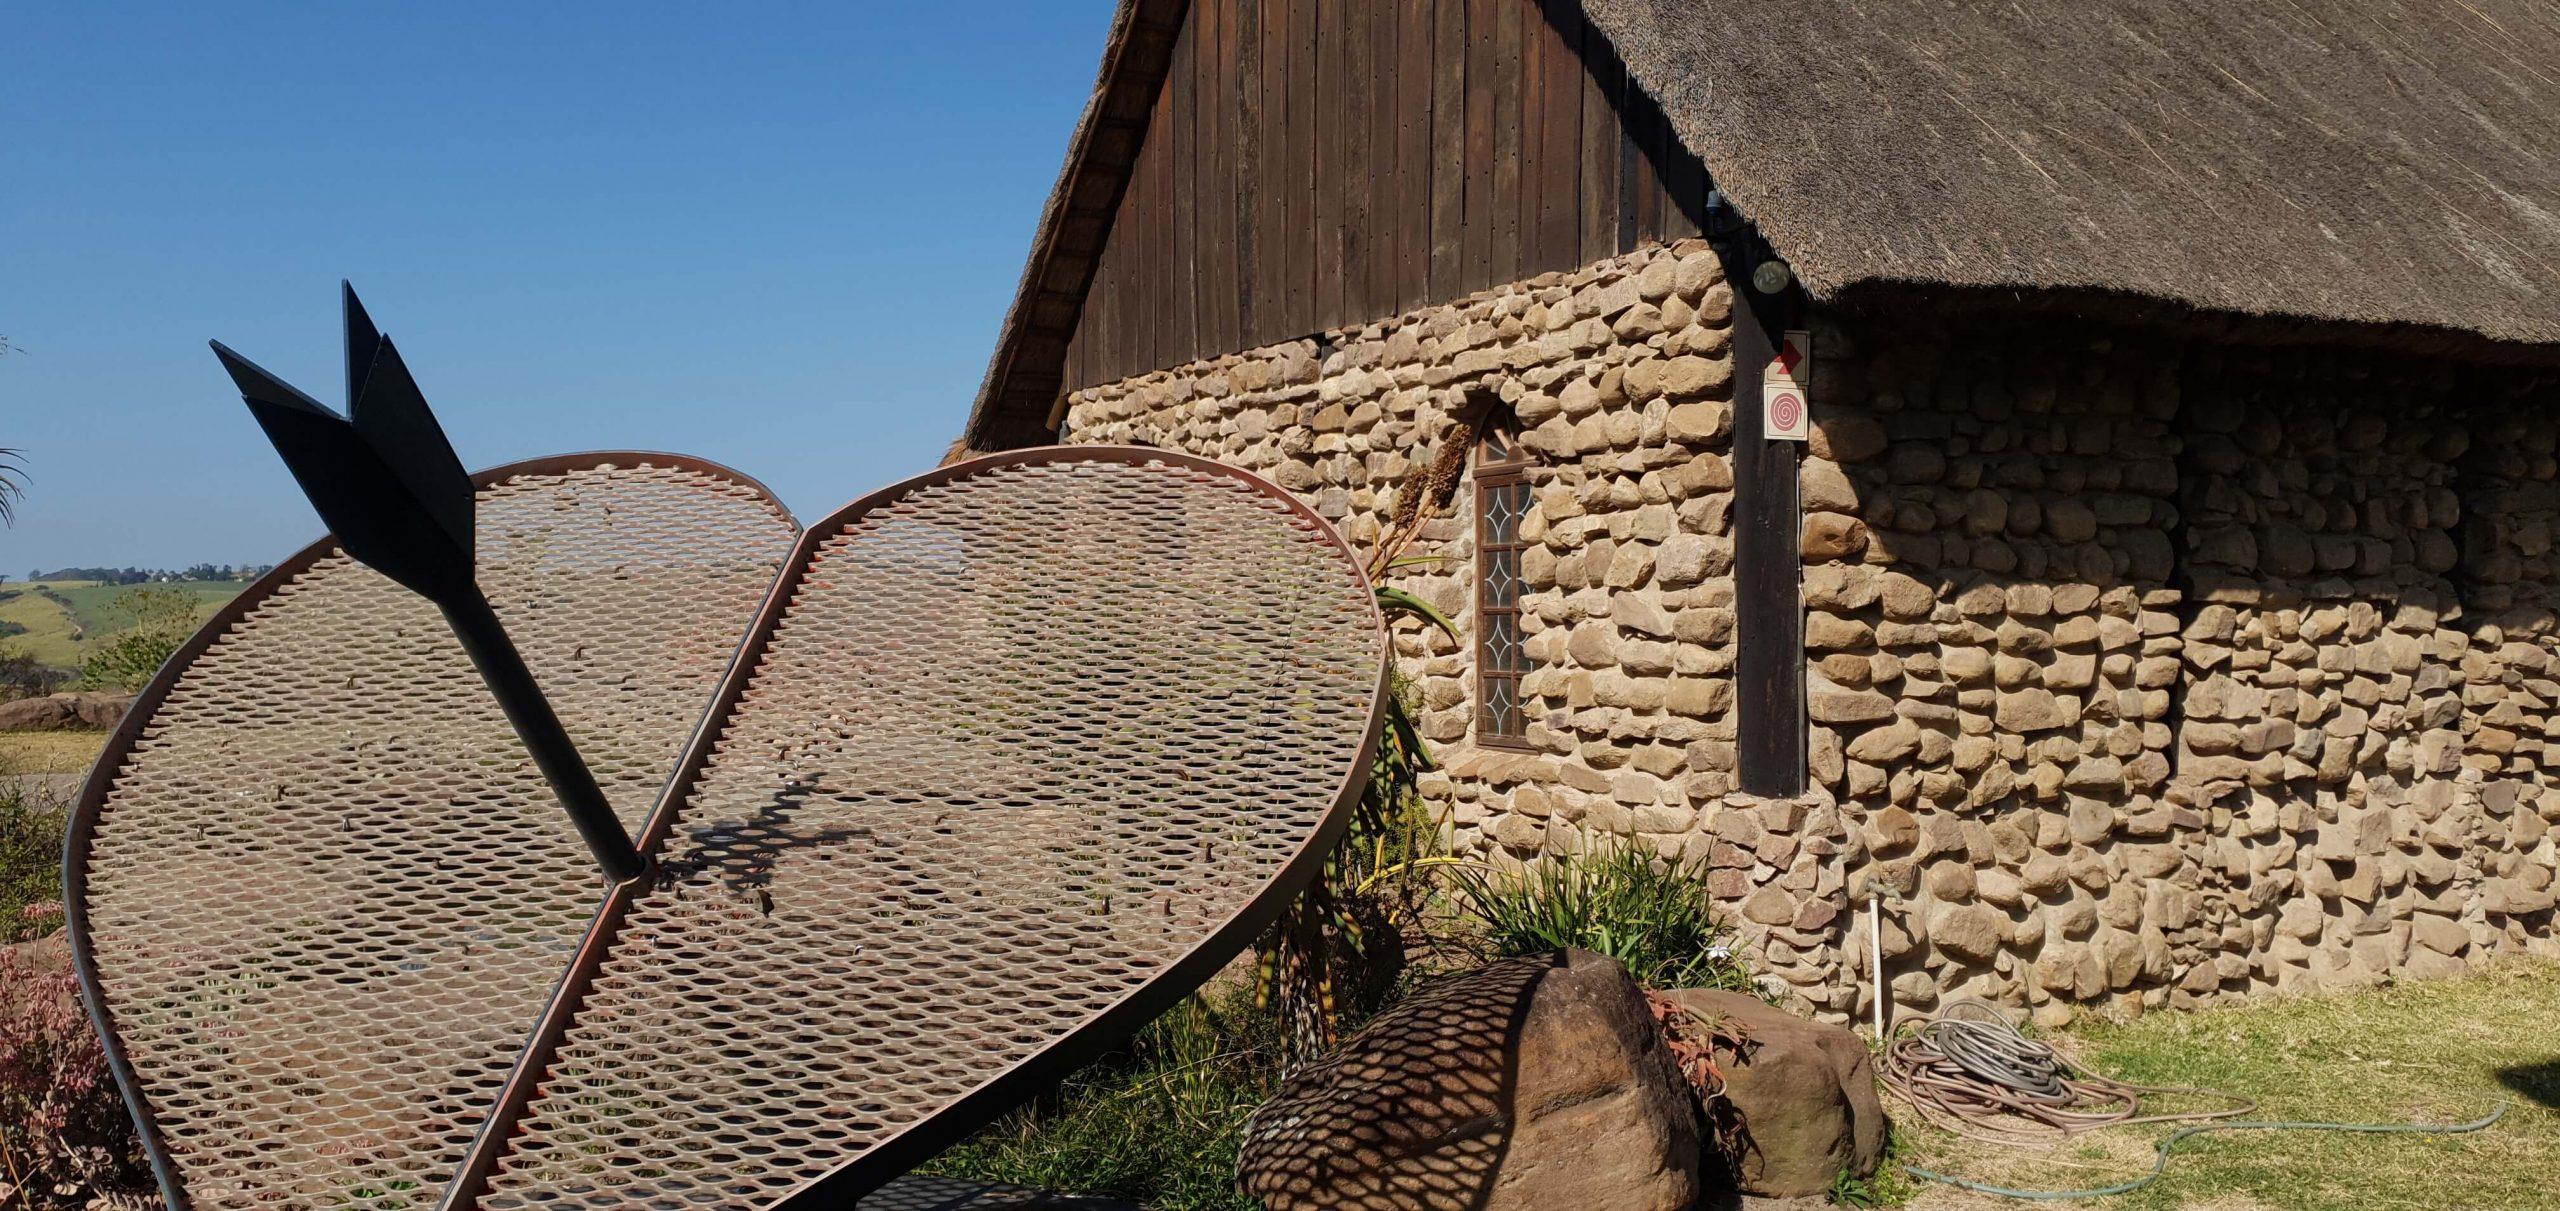 Rain Farm Game and Lodge Chapel